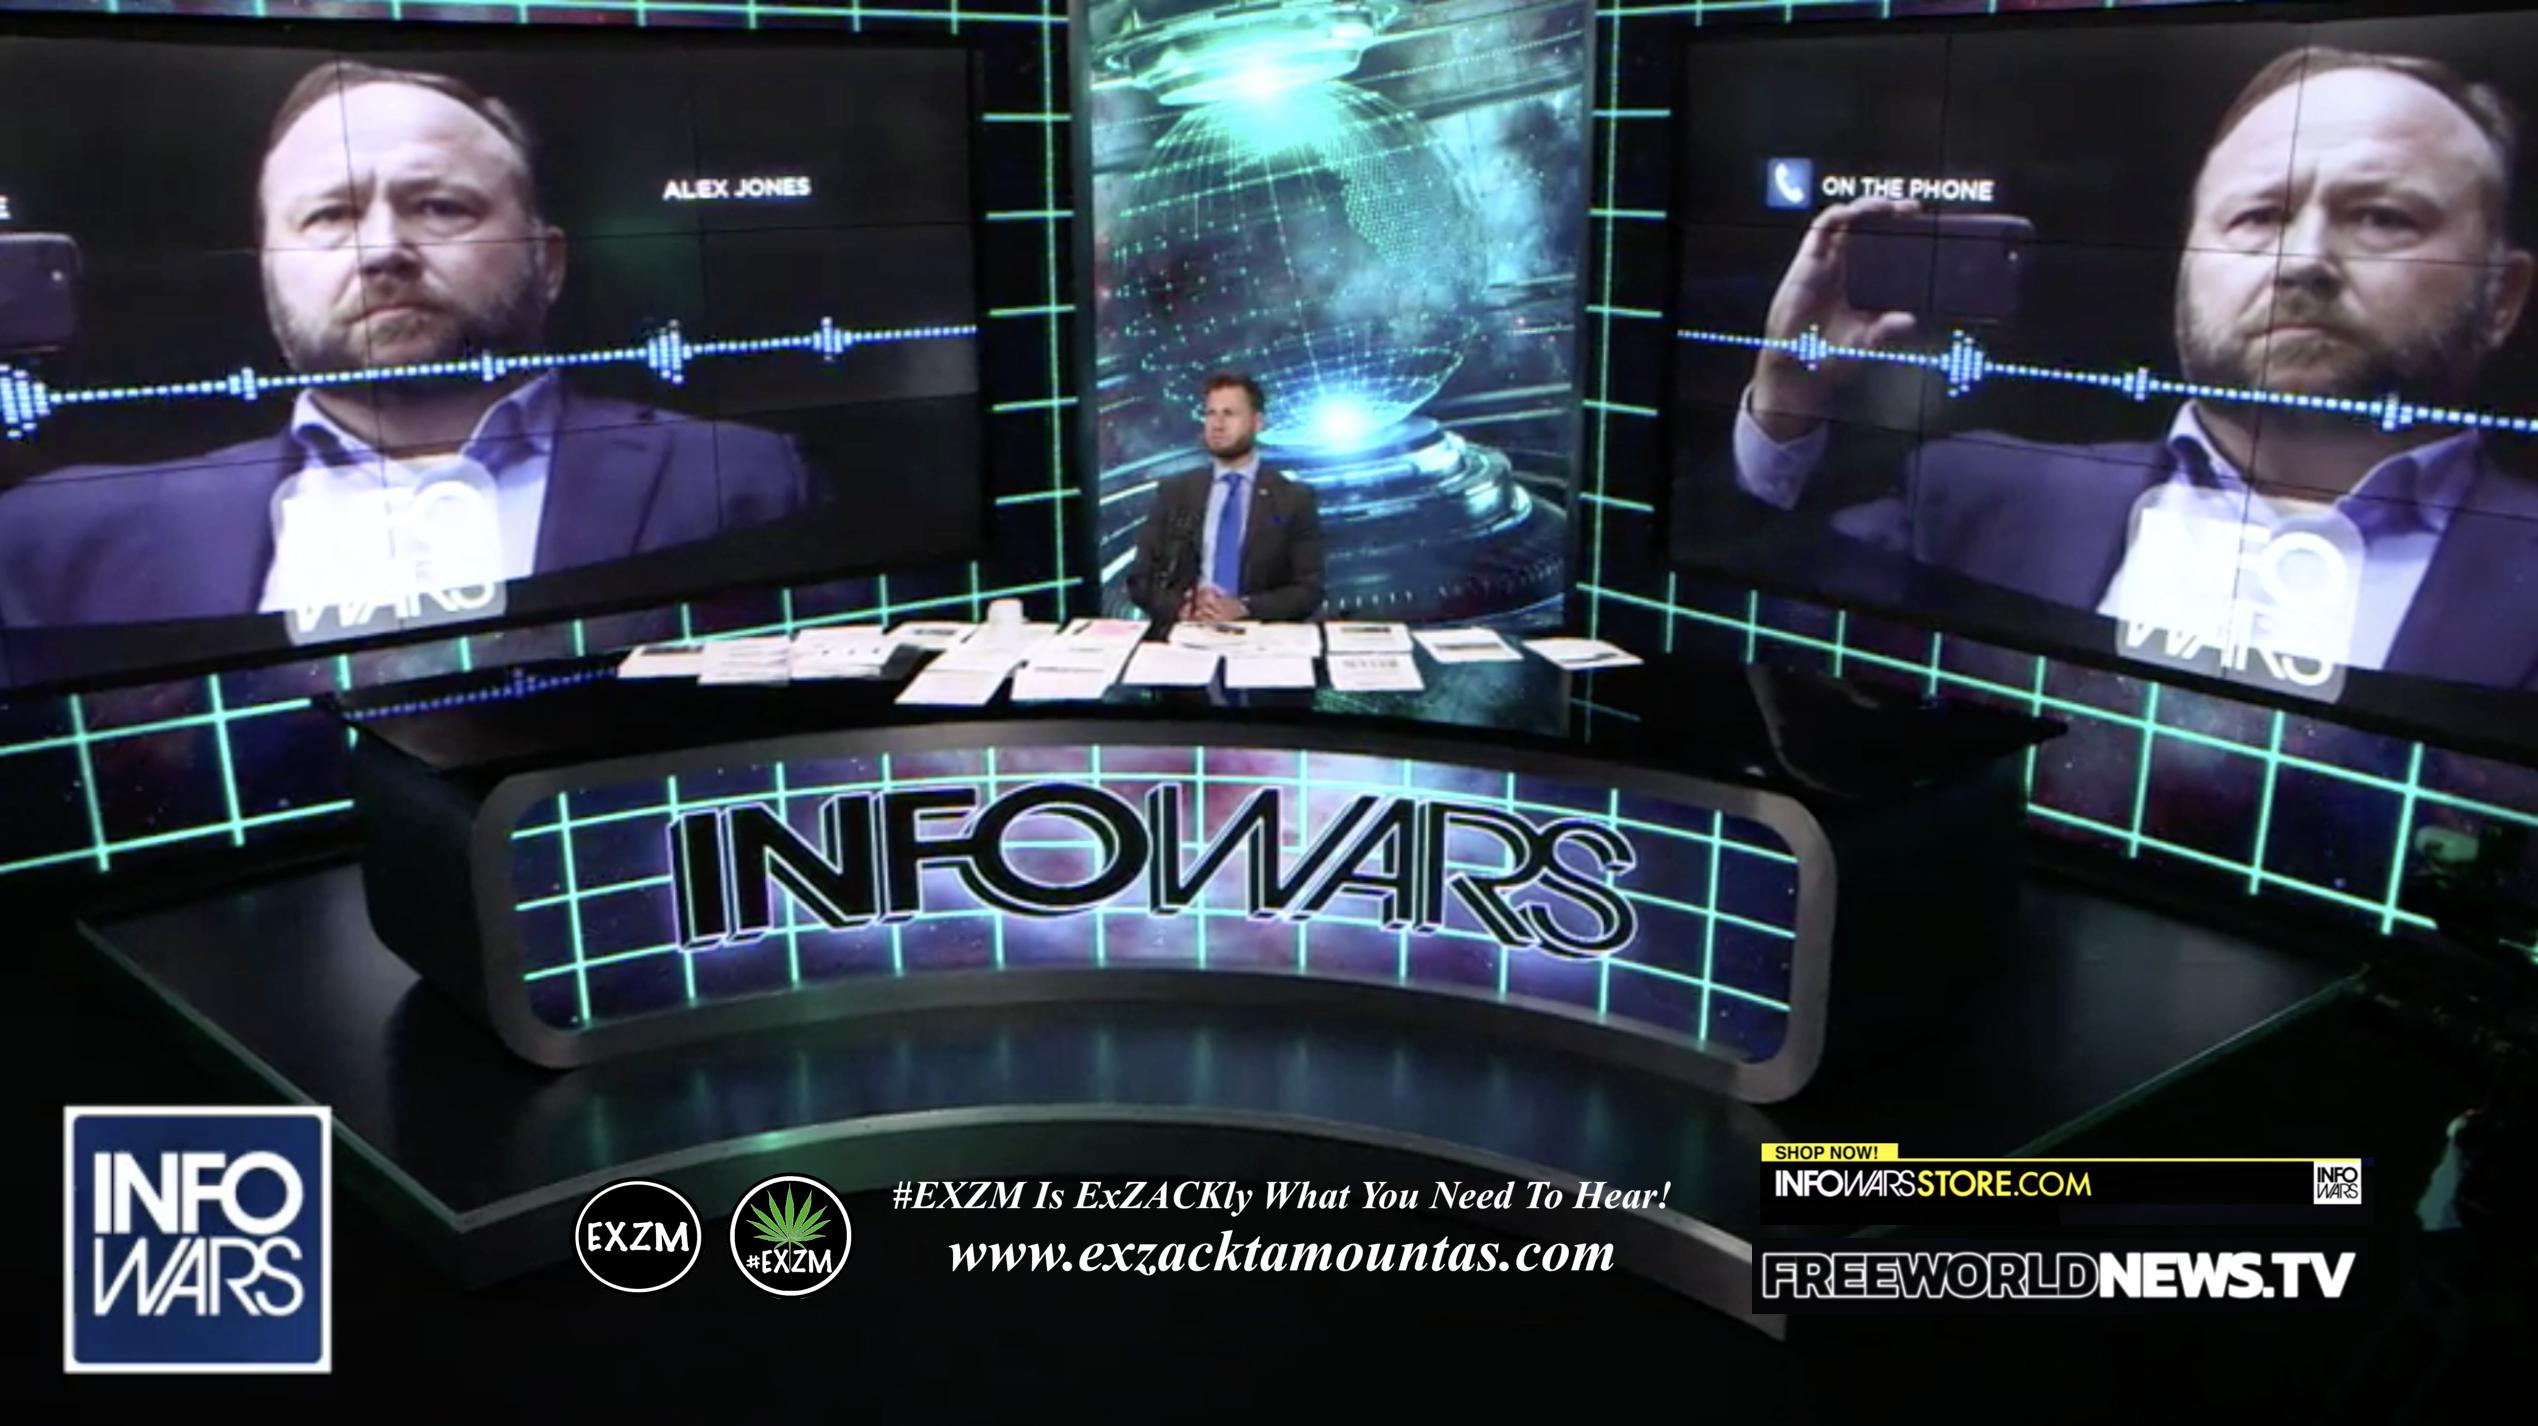 Alex Jones Owen Shroyer Live In Infowars Studio Free World News TV EXZM Zack Mount July 28th 2021 copy